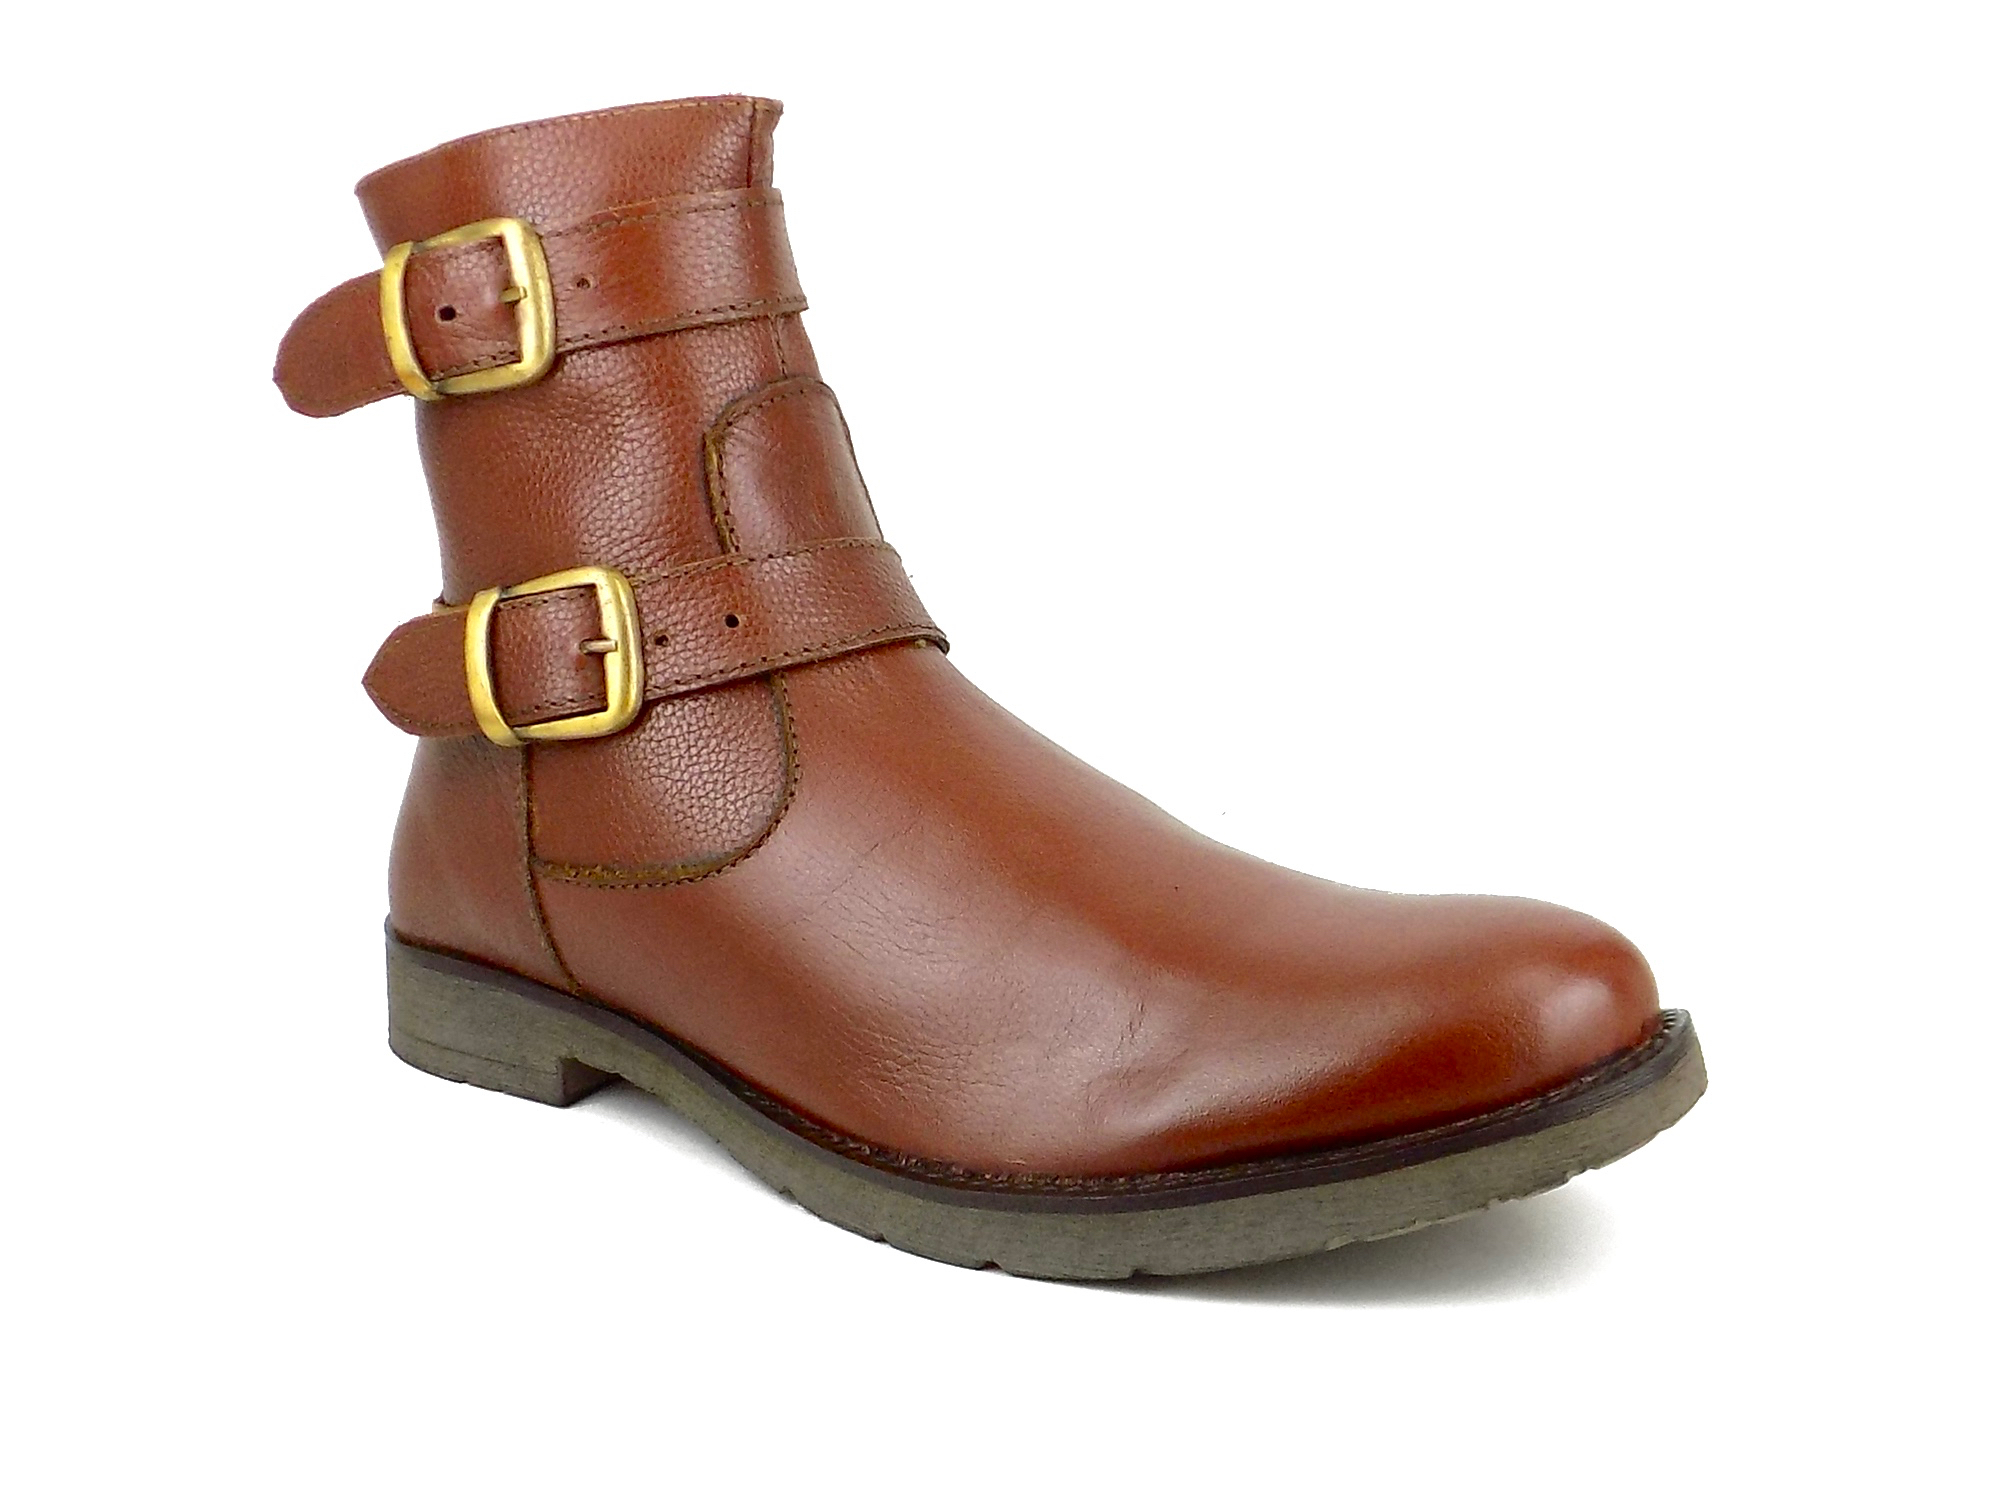 ripleybrooklyn Ripley Genuine Leather Albion Series Men Riding Boots